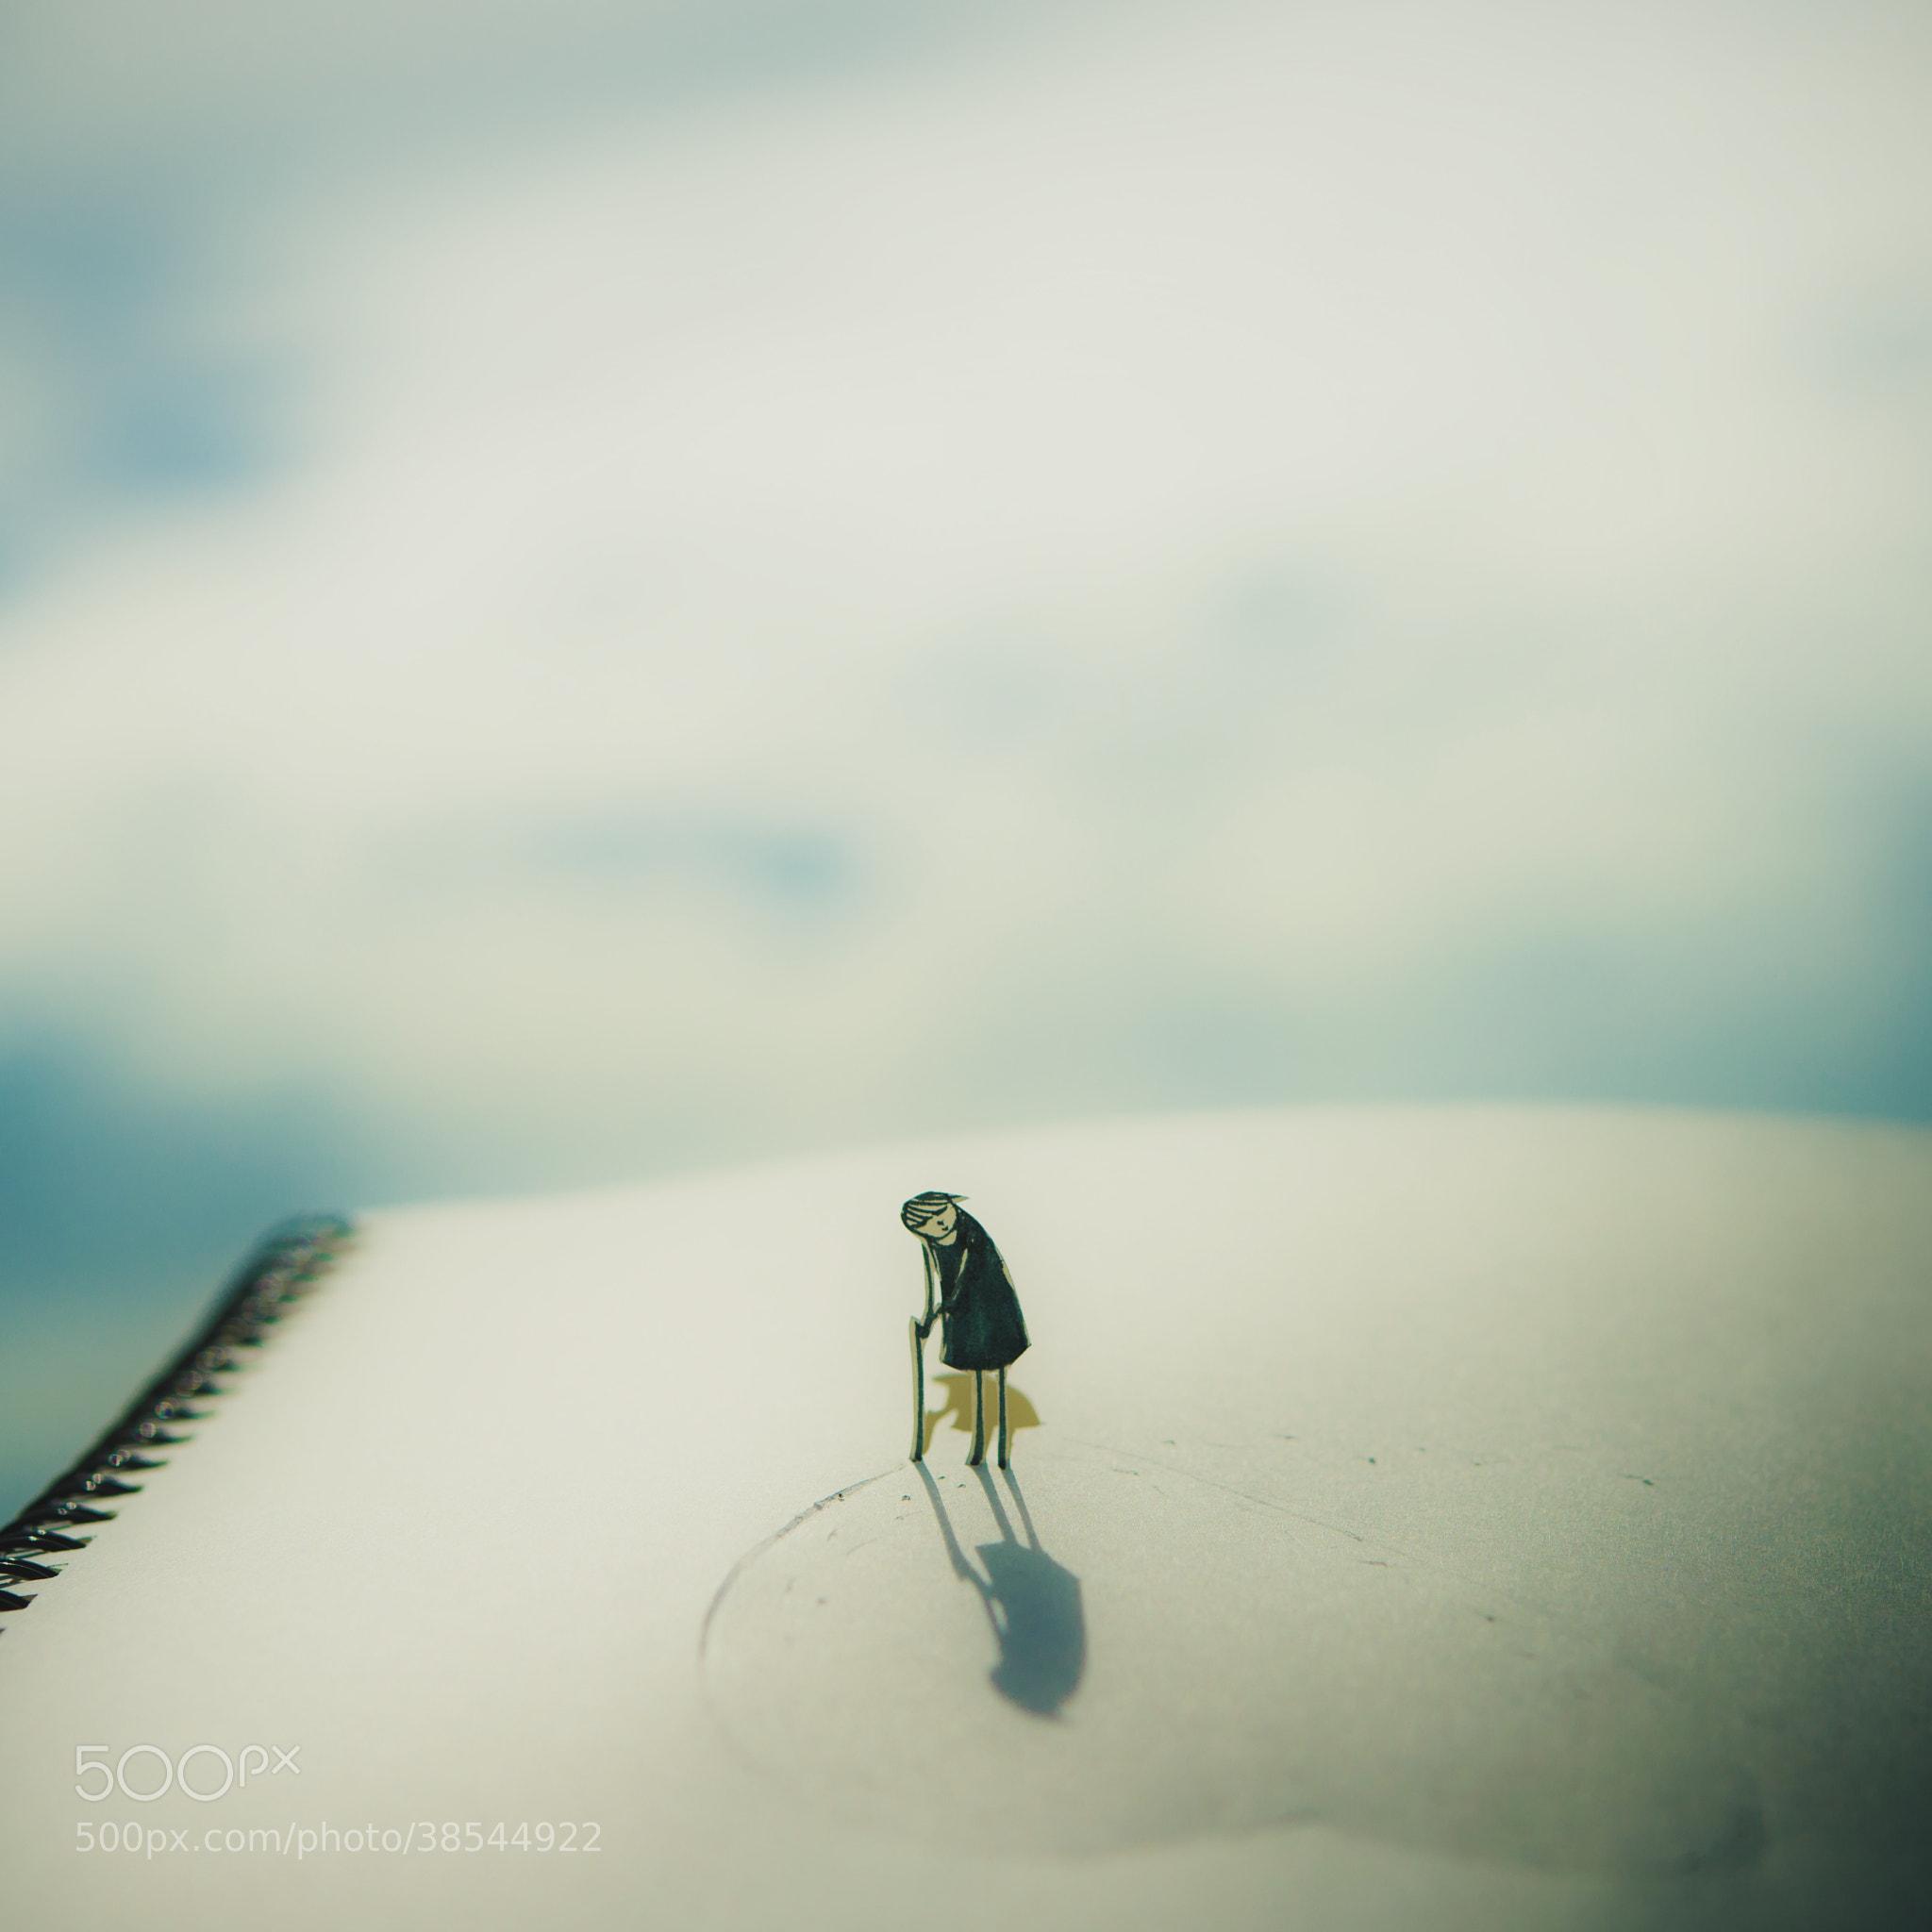 Photograph On the Beach by Kouichi Chiba on 500px